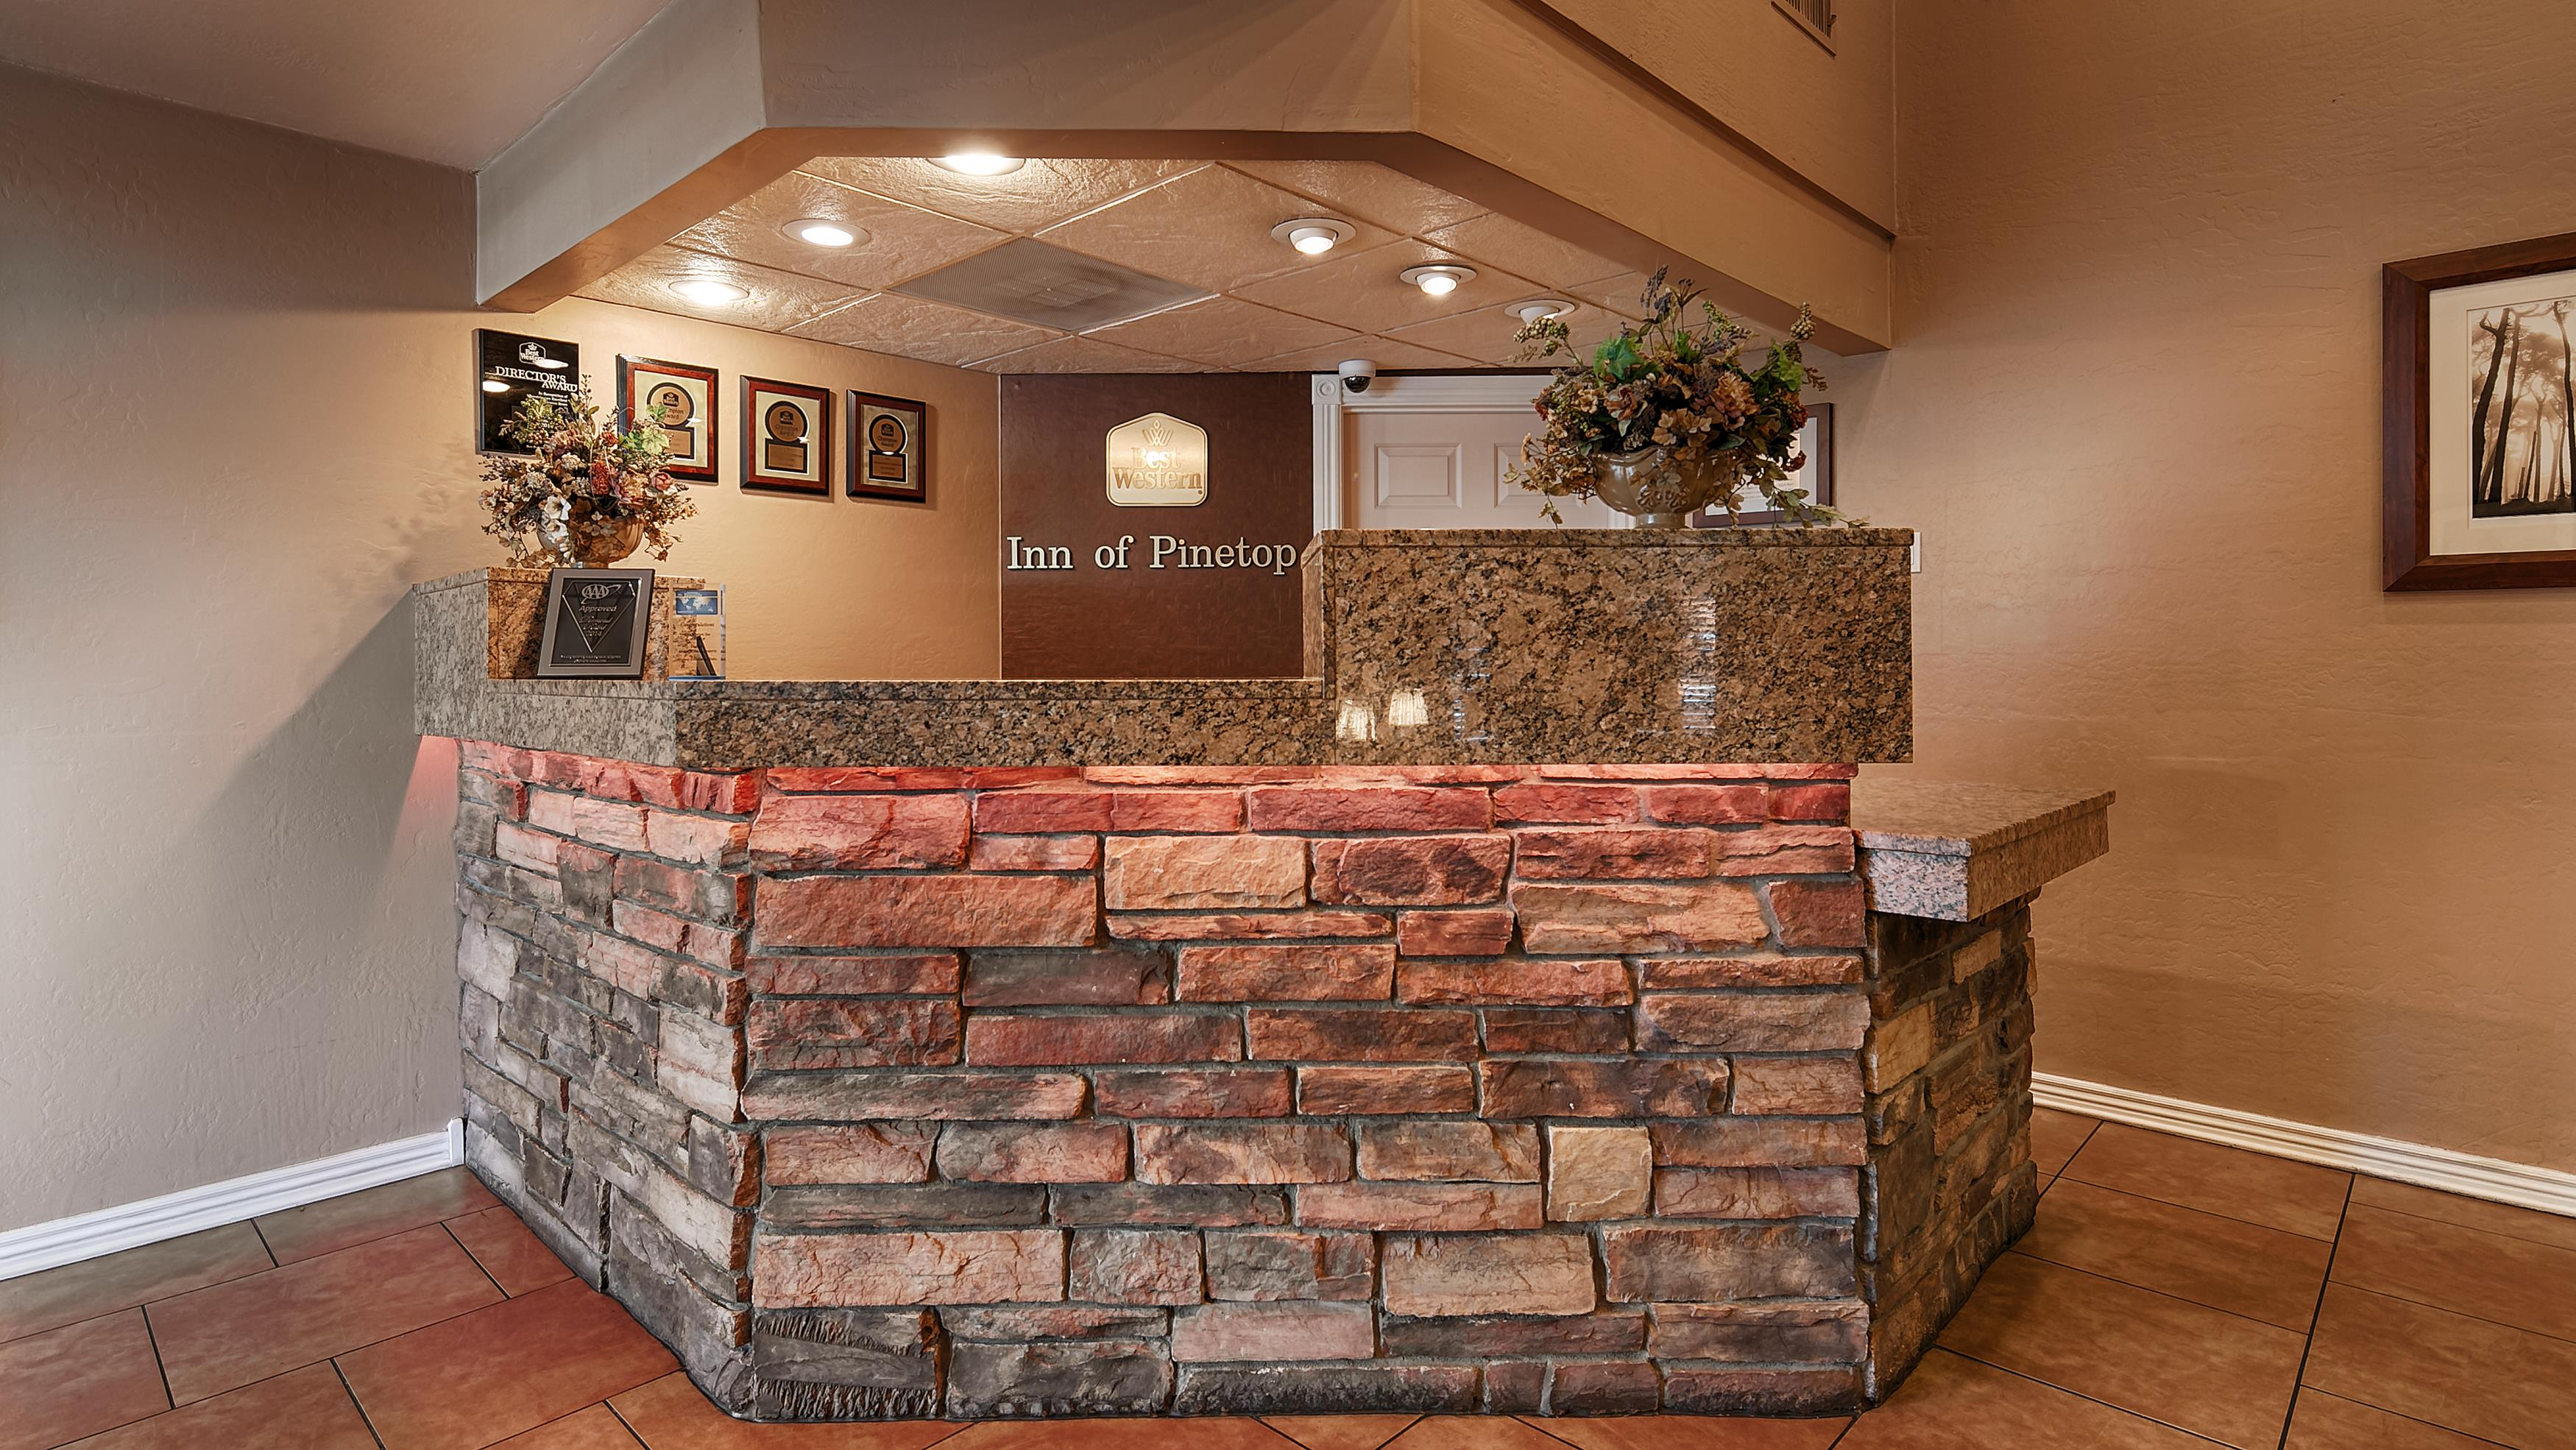 Best Western Inn Of Pinetop, Pinetop AZ